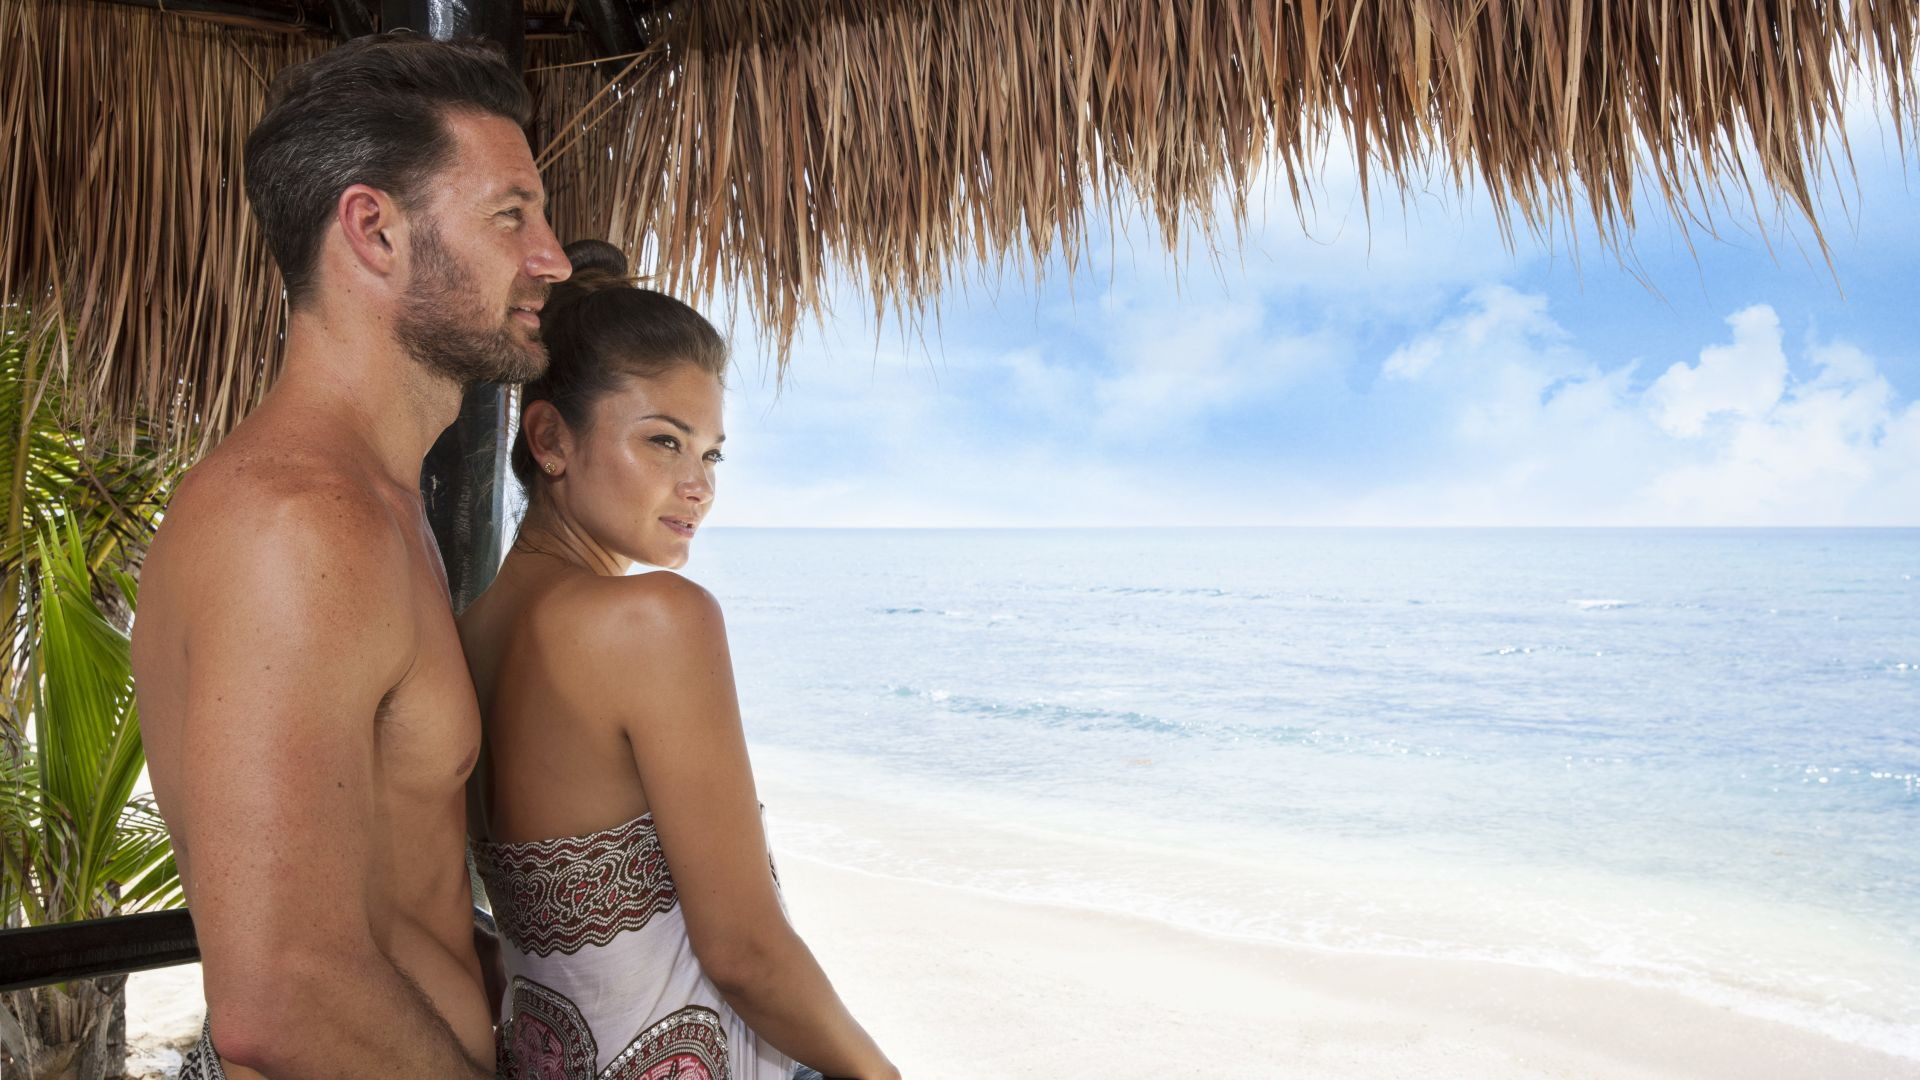 Naked girls on cancun beach All Inclusive Clothing Optional Resort Hidden Beach